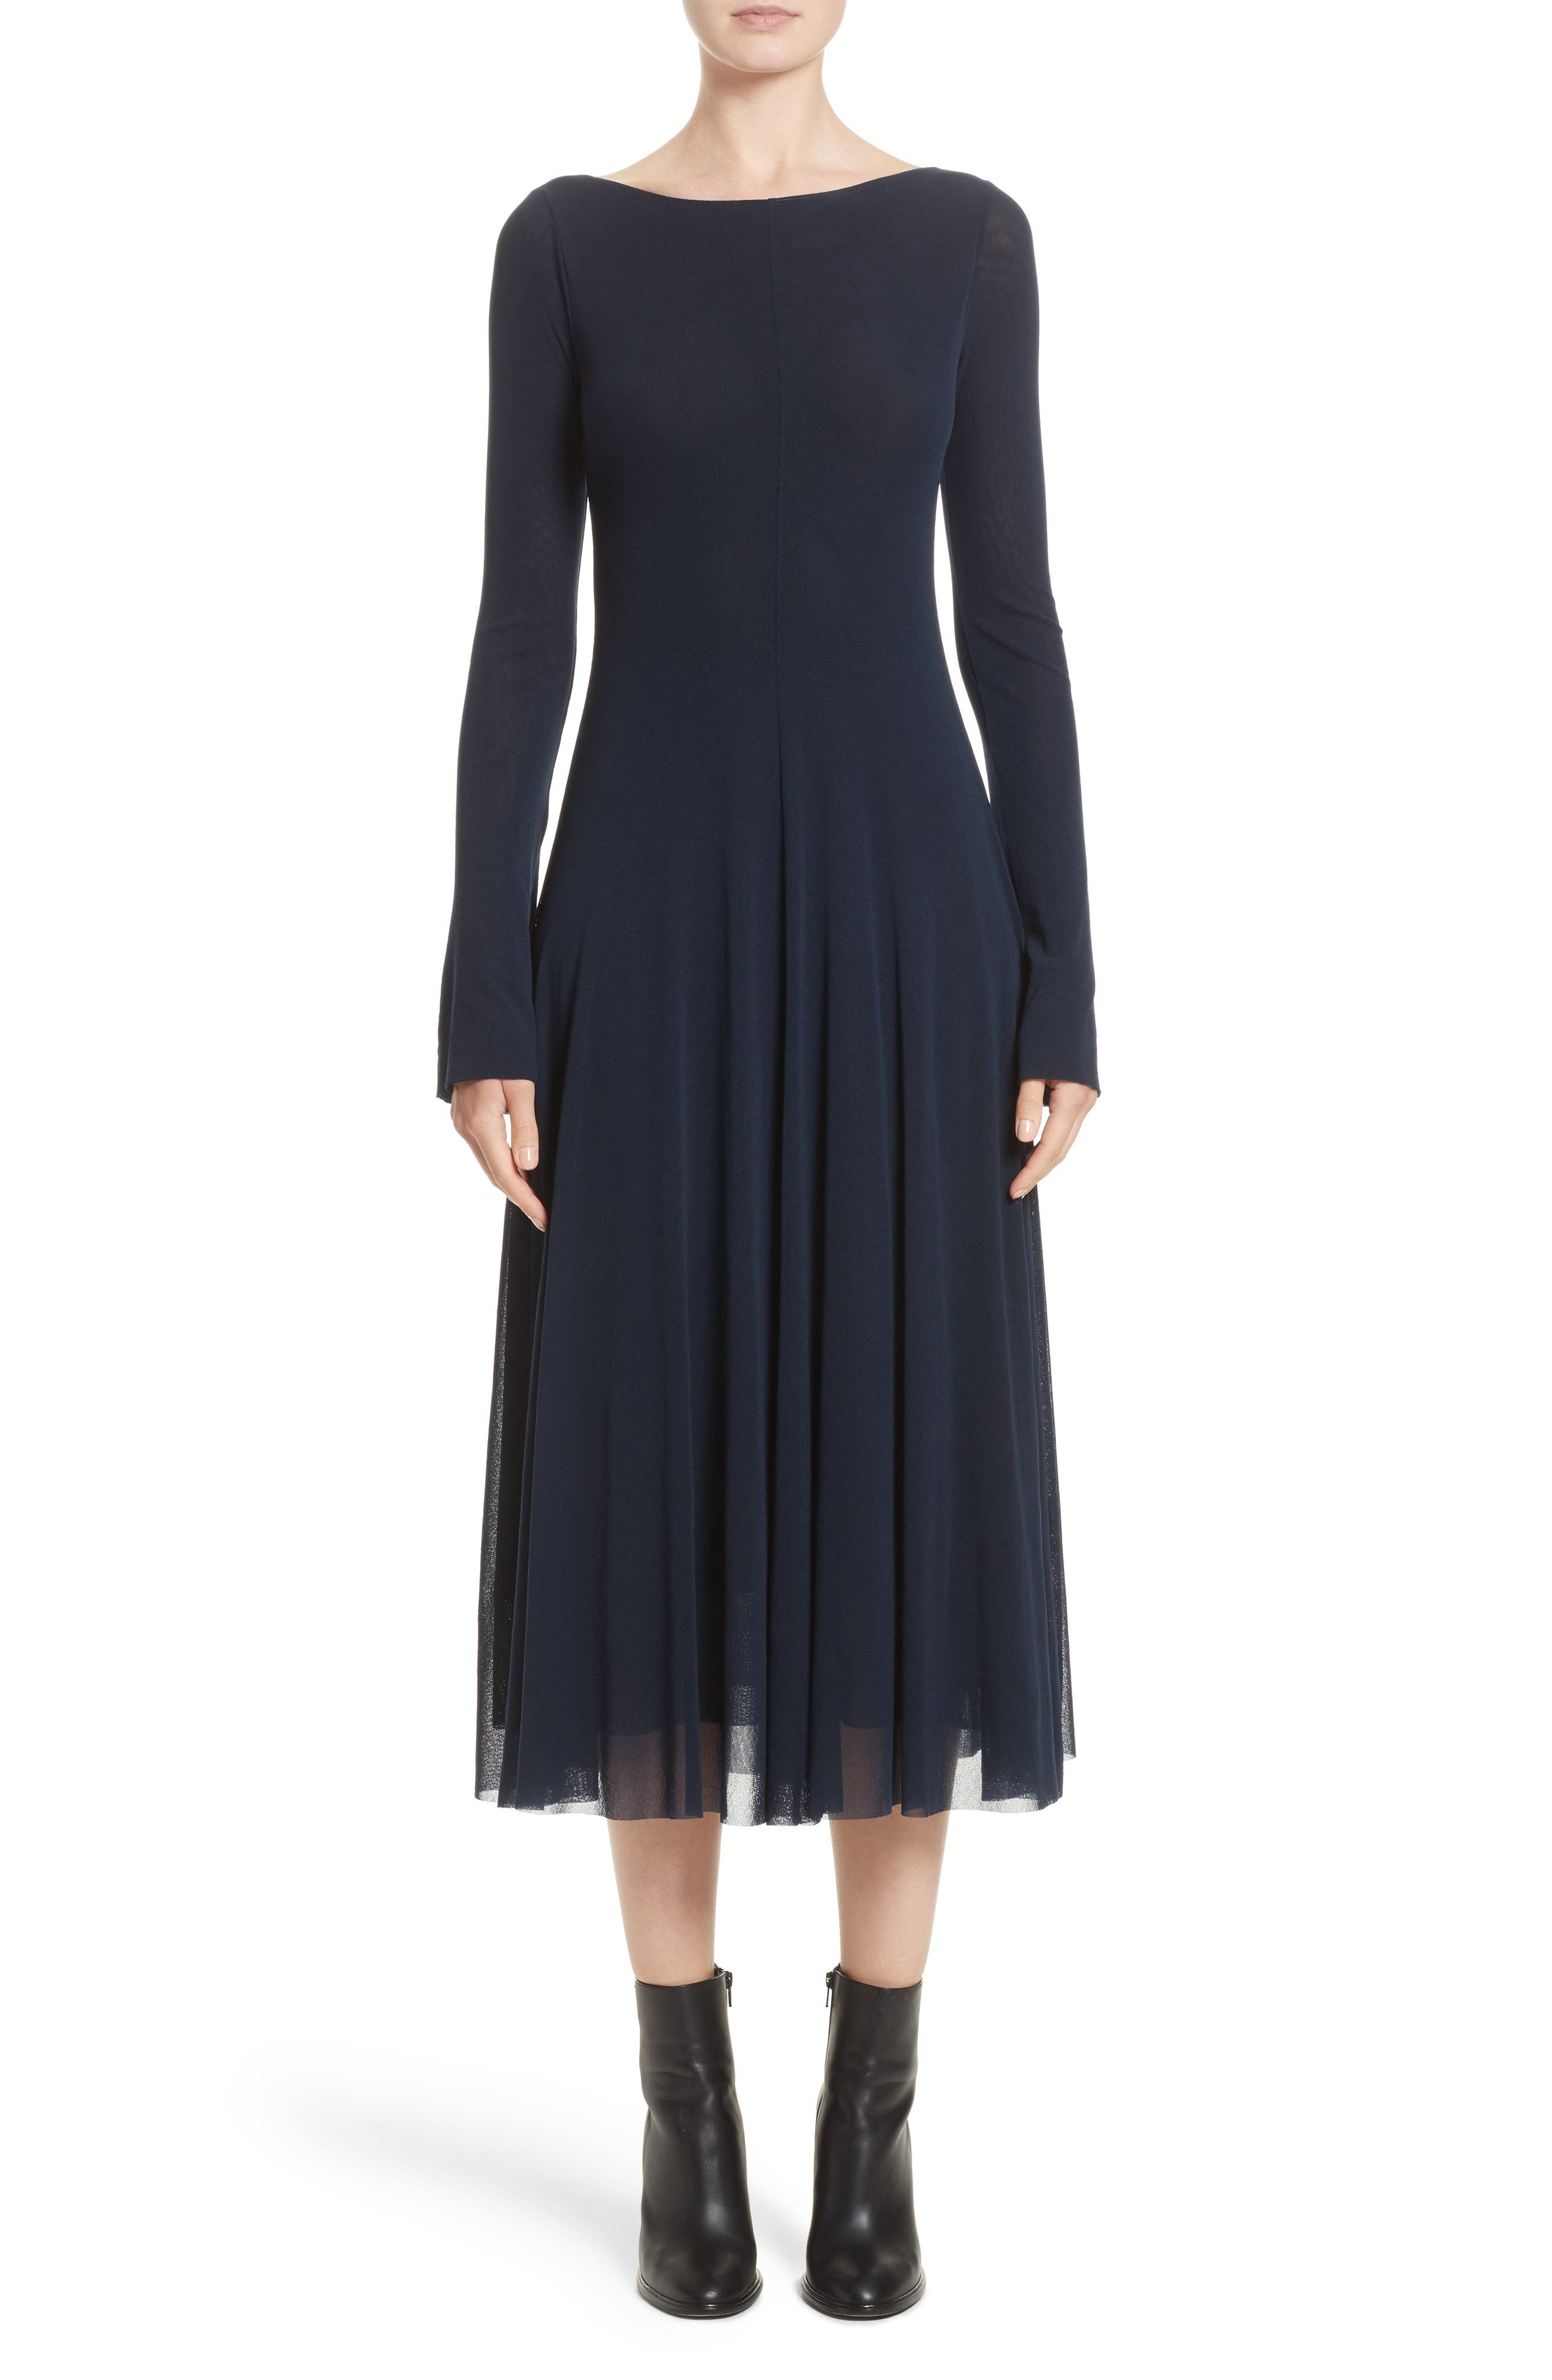 Reversible Tulle Dress,                             Main thumbnail 1, color,                             001